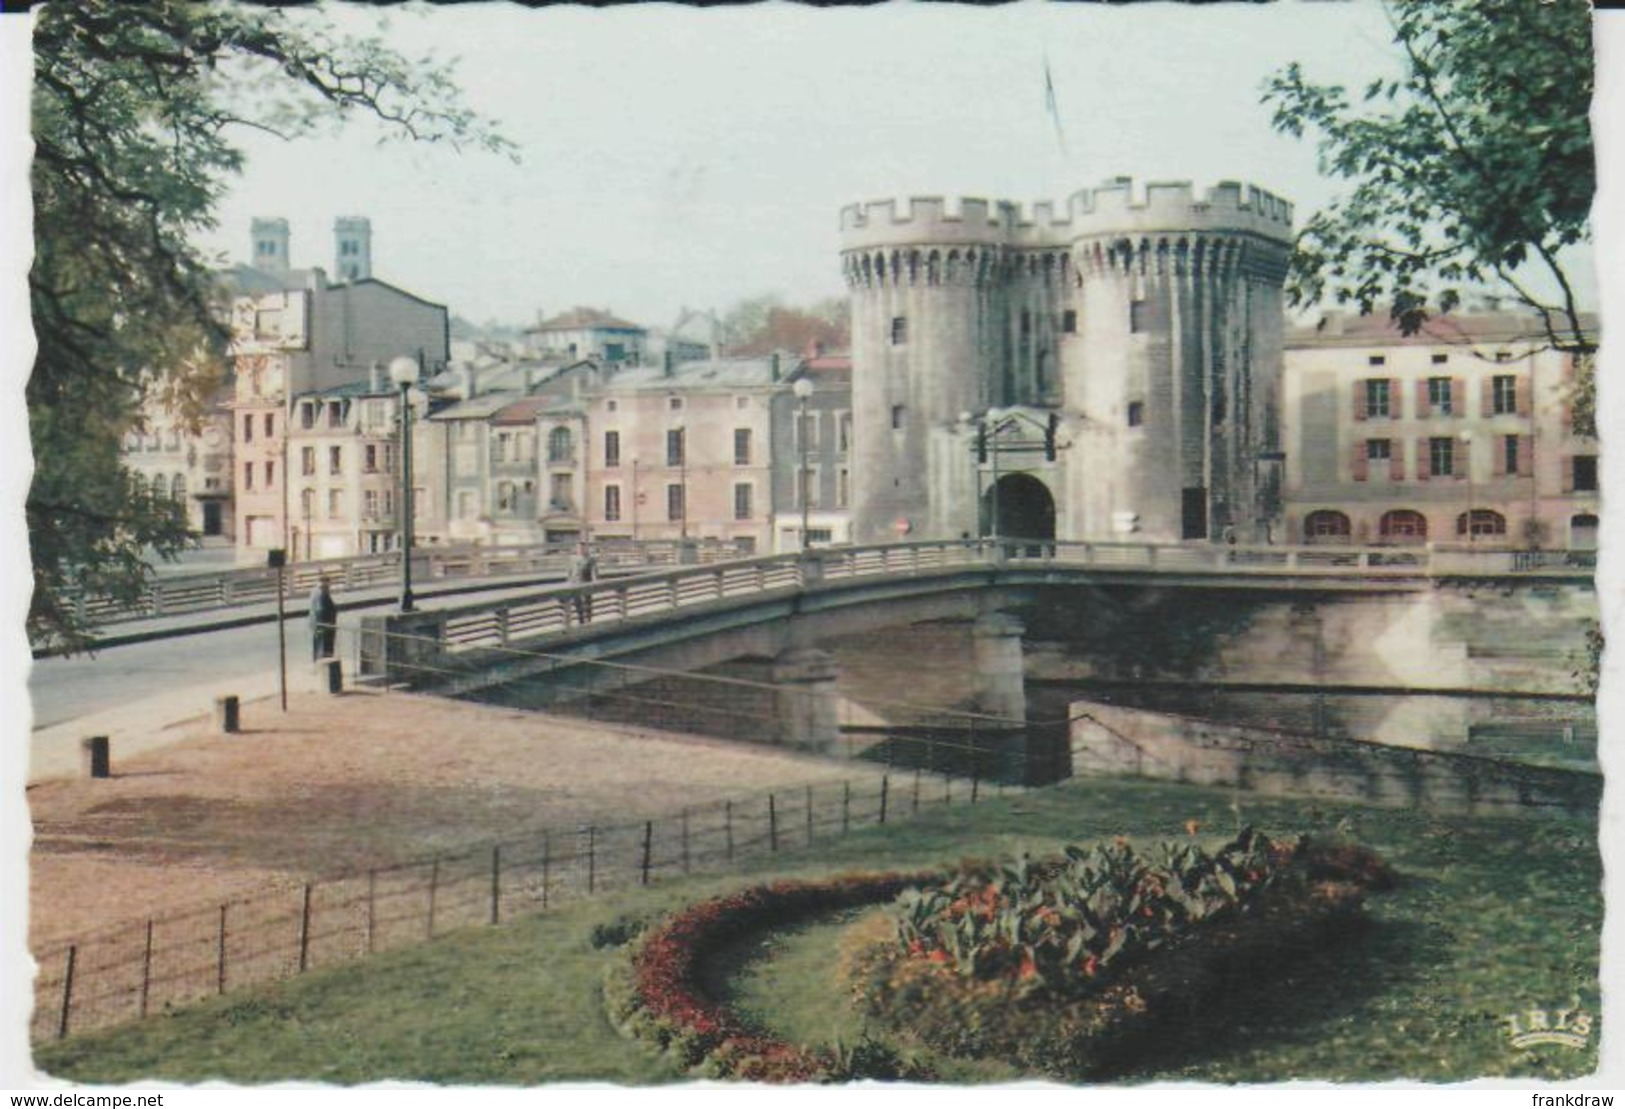 Postcard - Verdun - Chausee Bridge And Gate - No Card No  - Unused Very Good - Postcards